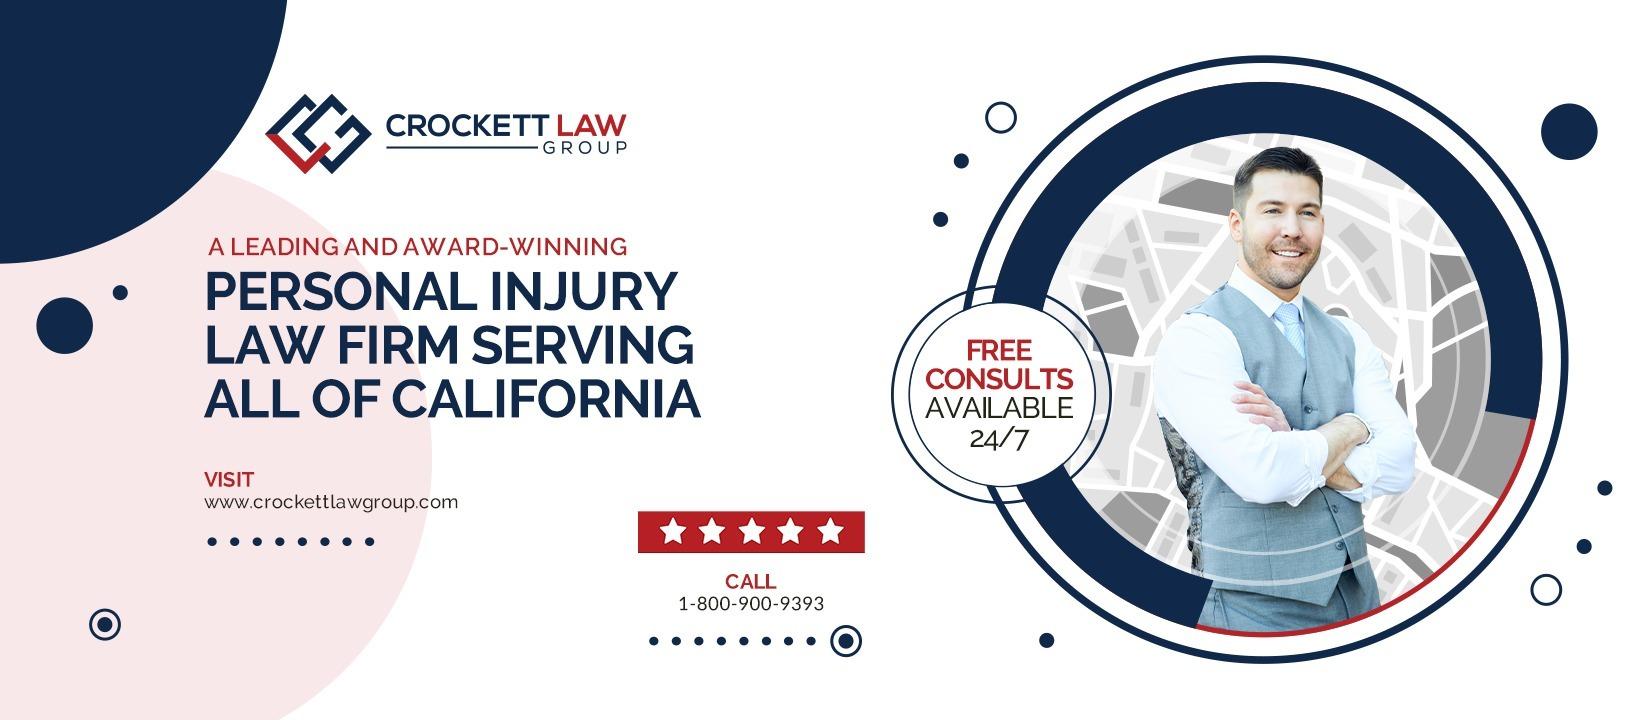 Crockett Law Group (@crockettlawgroup) Cover Image